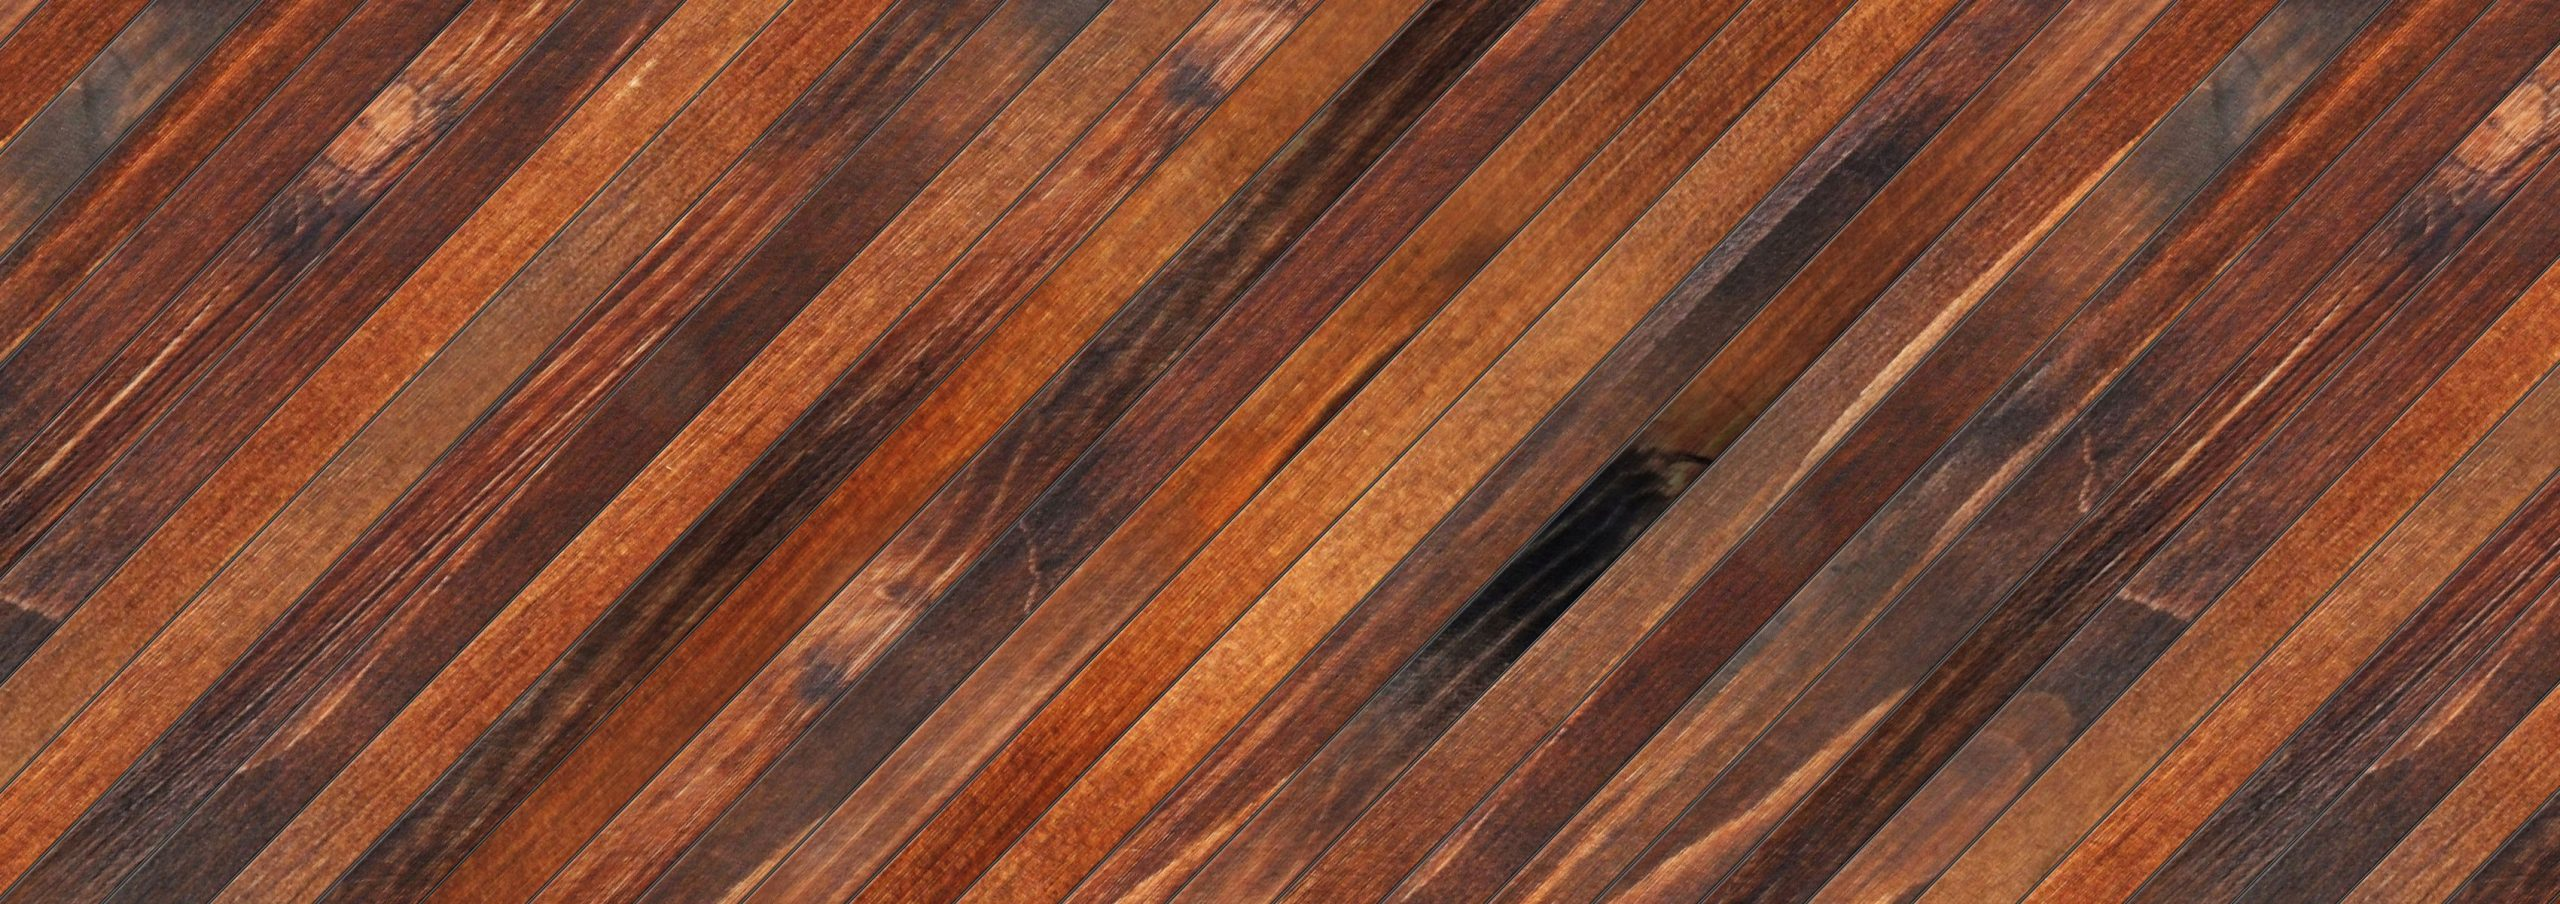 Wooden floor sanding and polishing Sydney